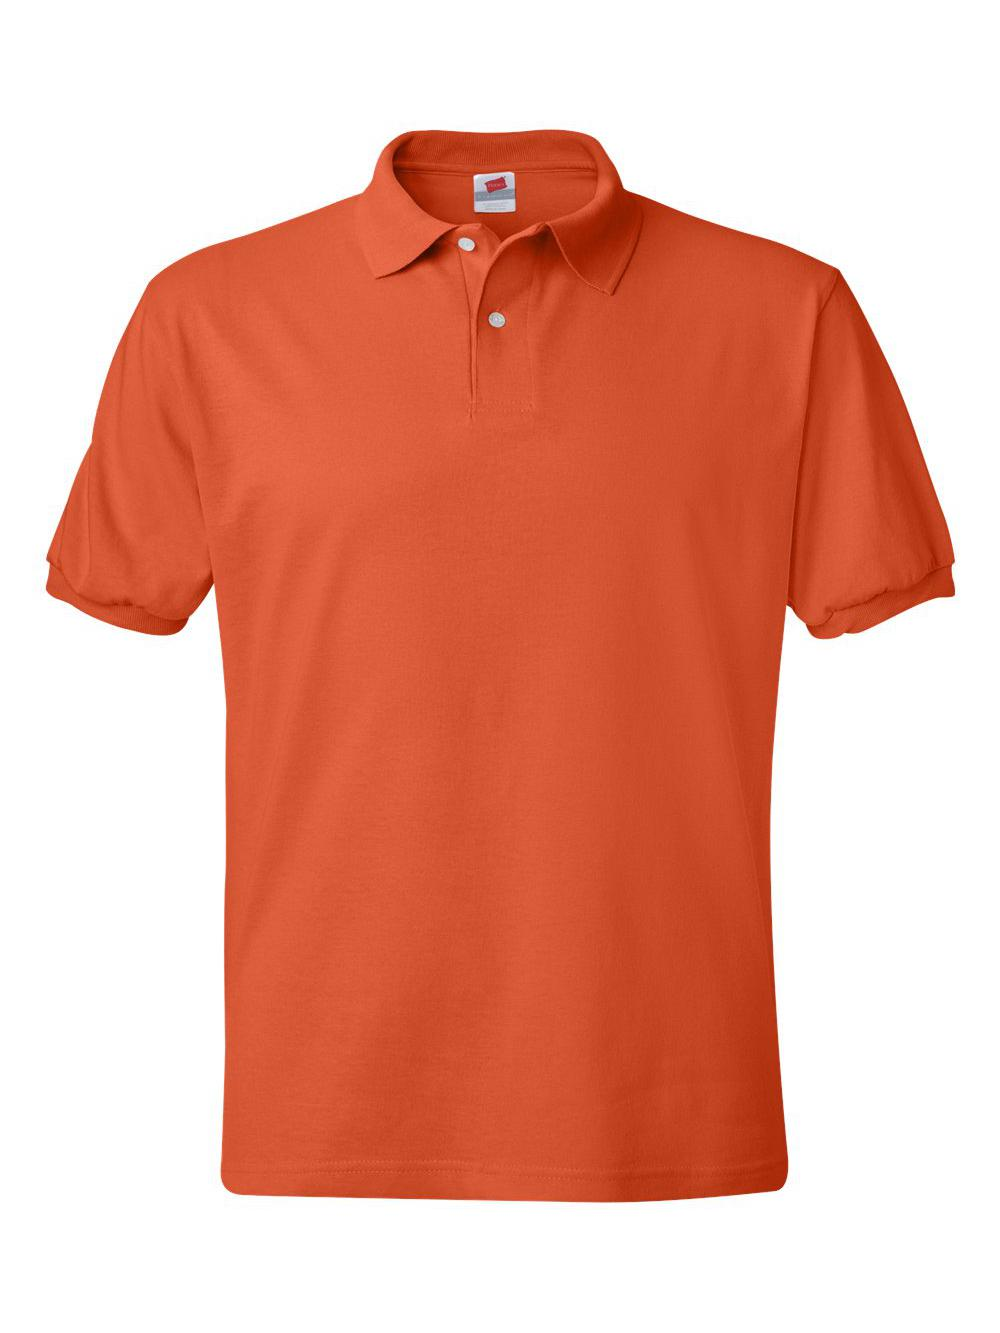 Hanes-Ecosmart-Jersey-Sport-Shirt-054X thumbnail 36